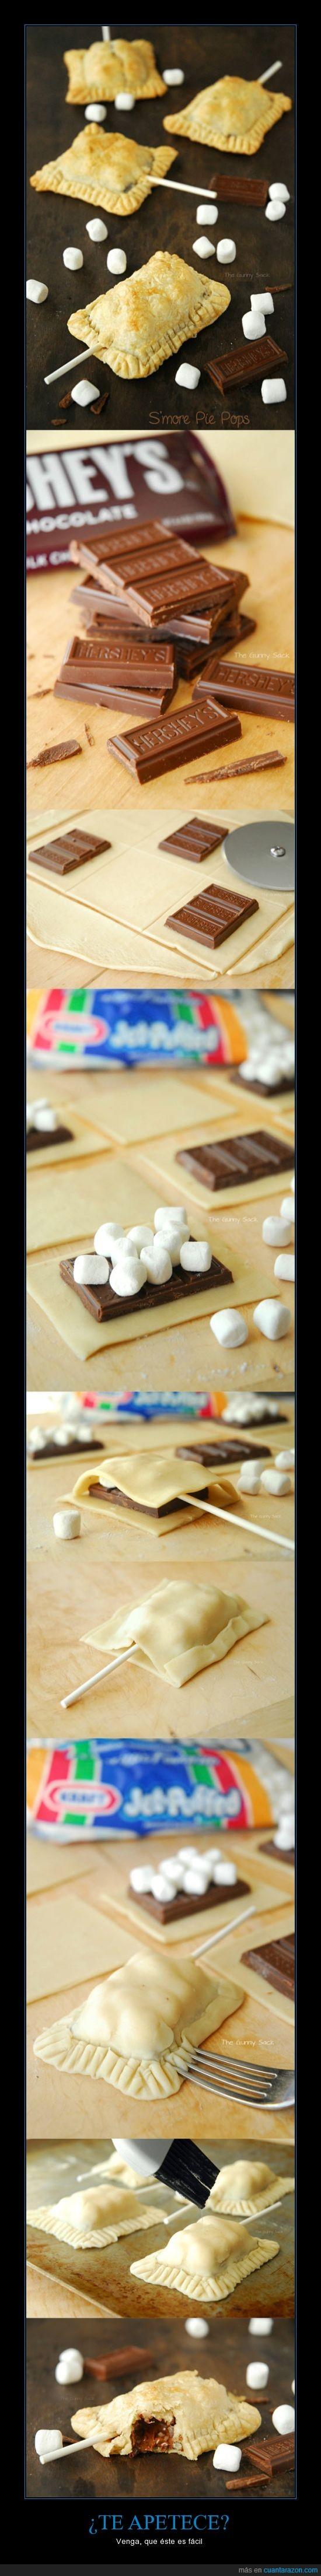 chocolate,comida,diabetes,gordos,postre,receta,smores